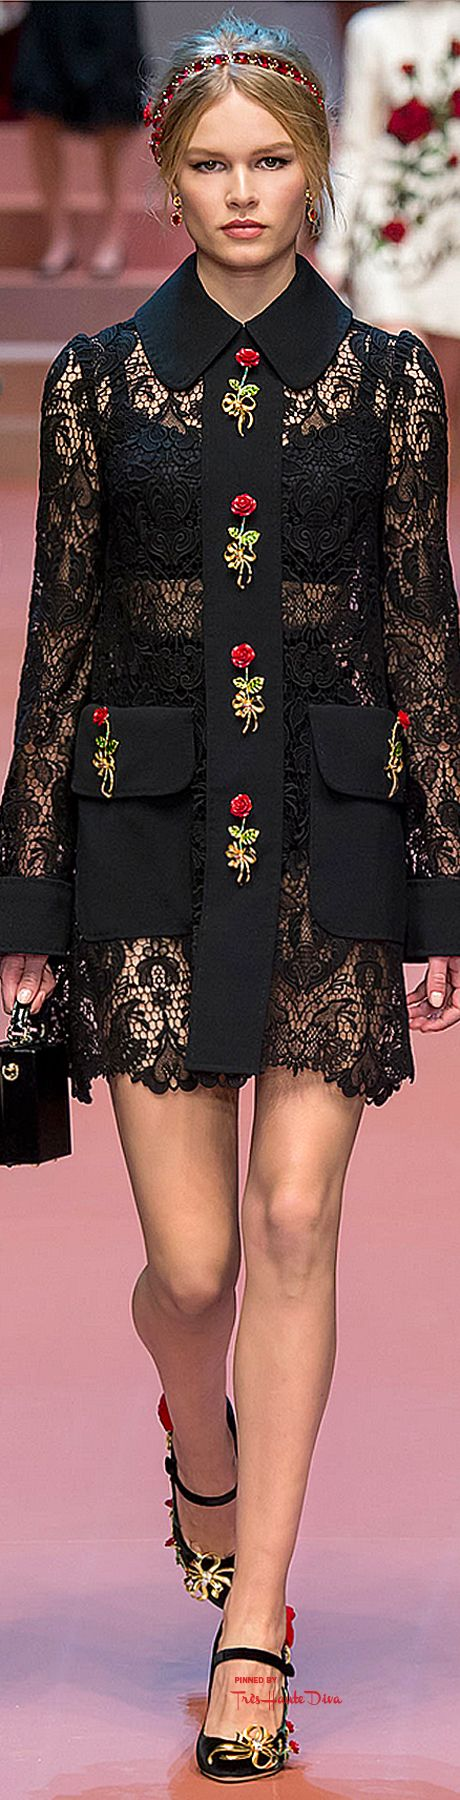 Mailand Fashion Week Report Herbst/Winter 2015/16